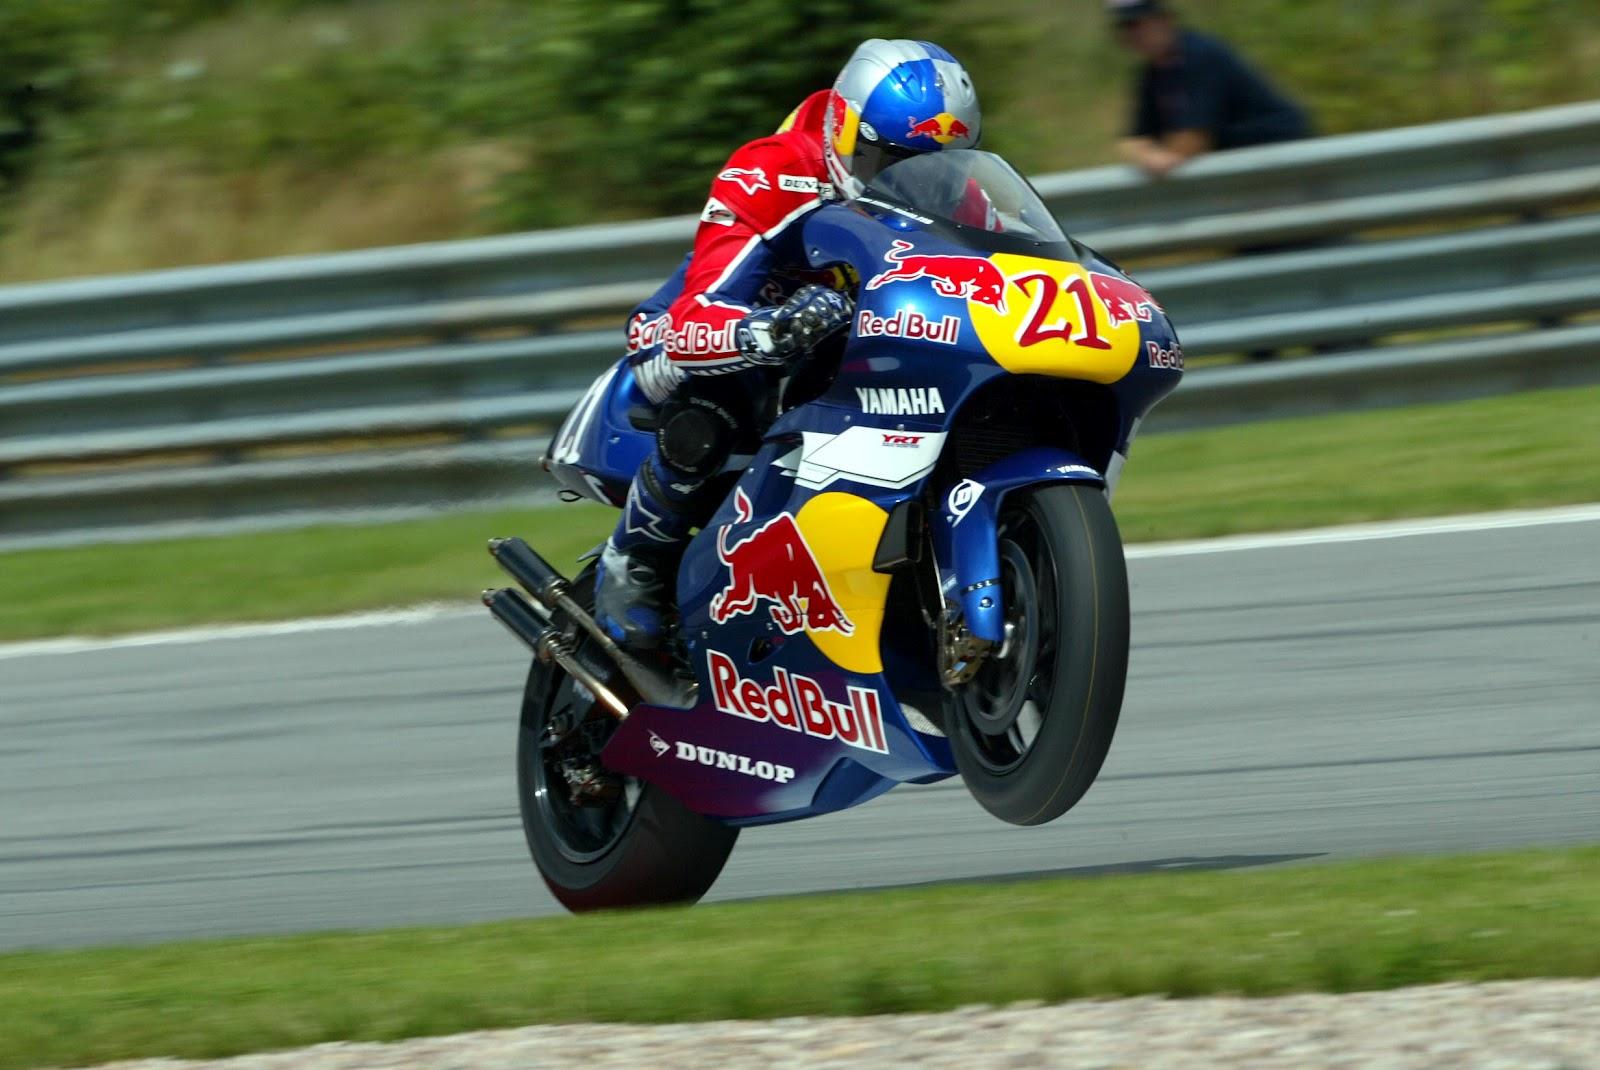 Fotos 500cc/250cc/125cc Wgzxxd